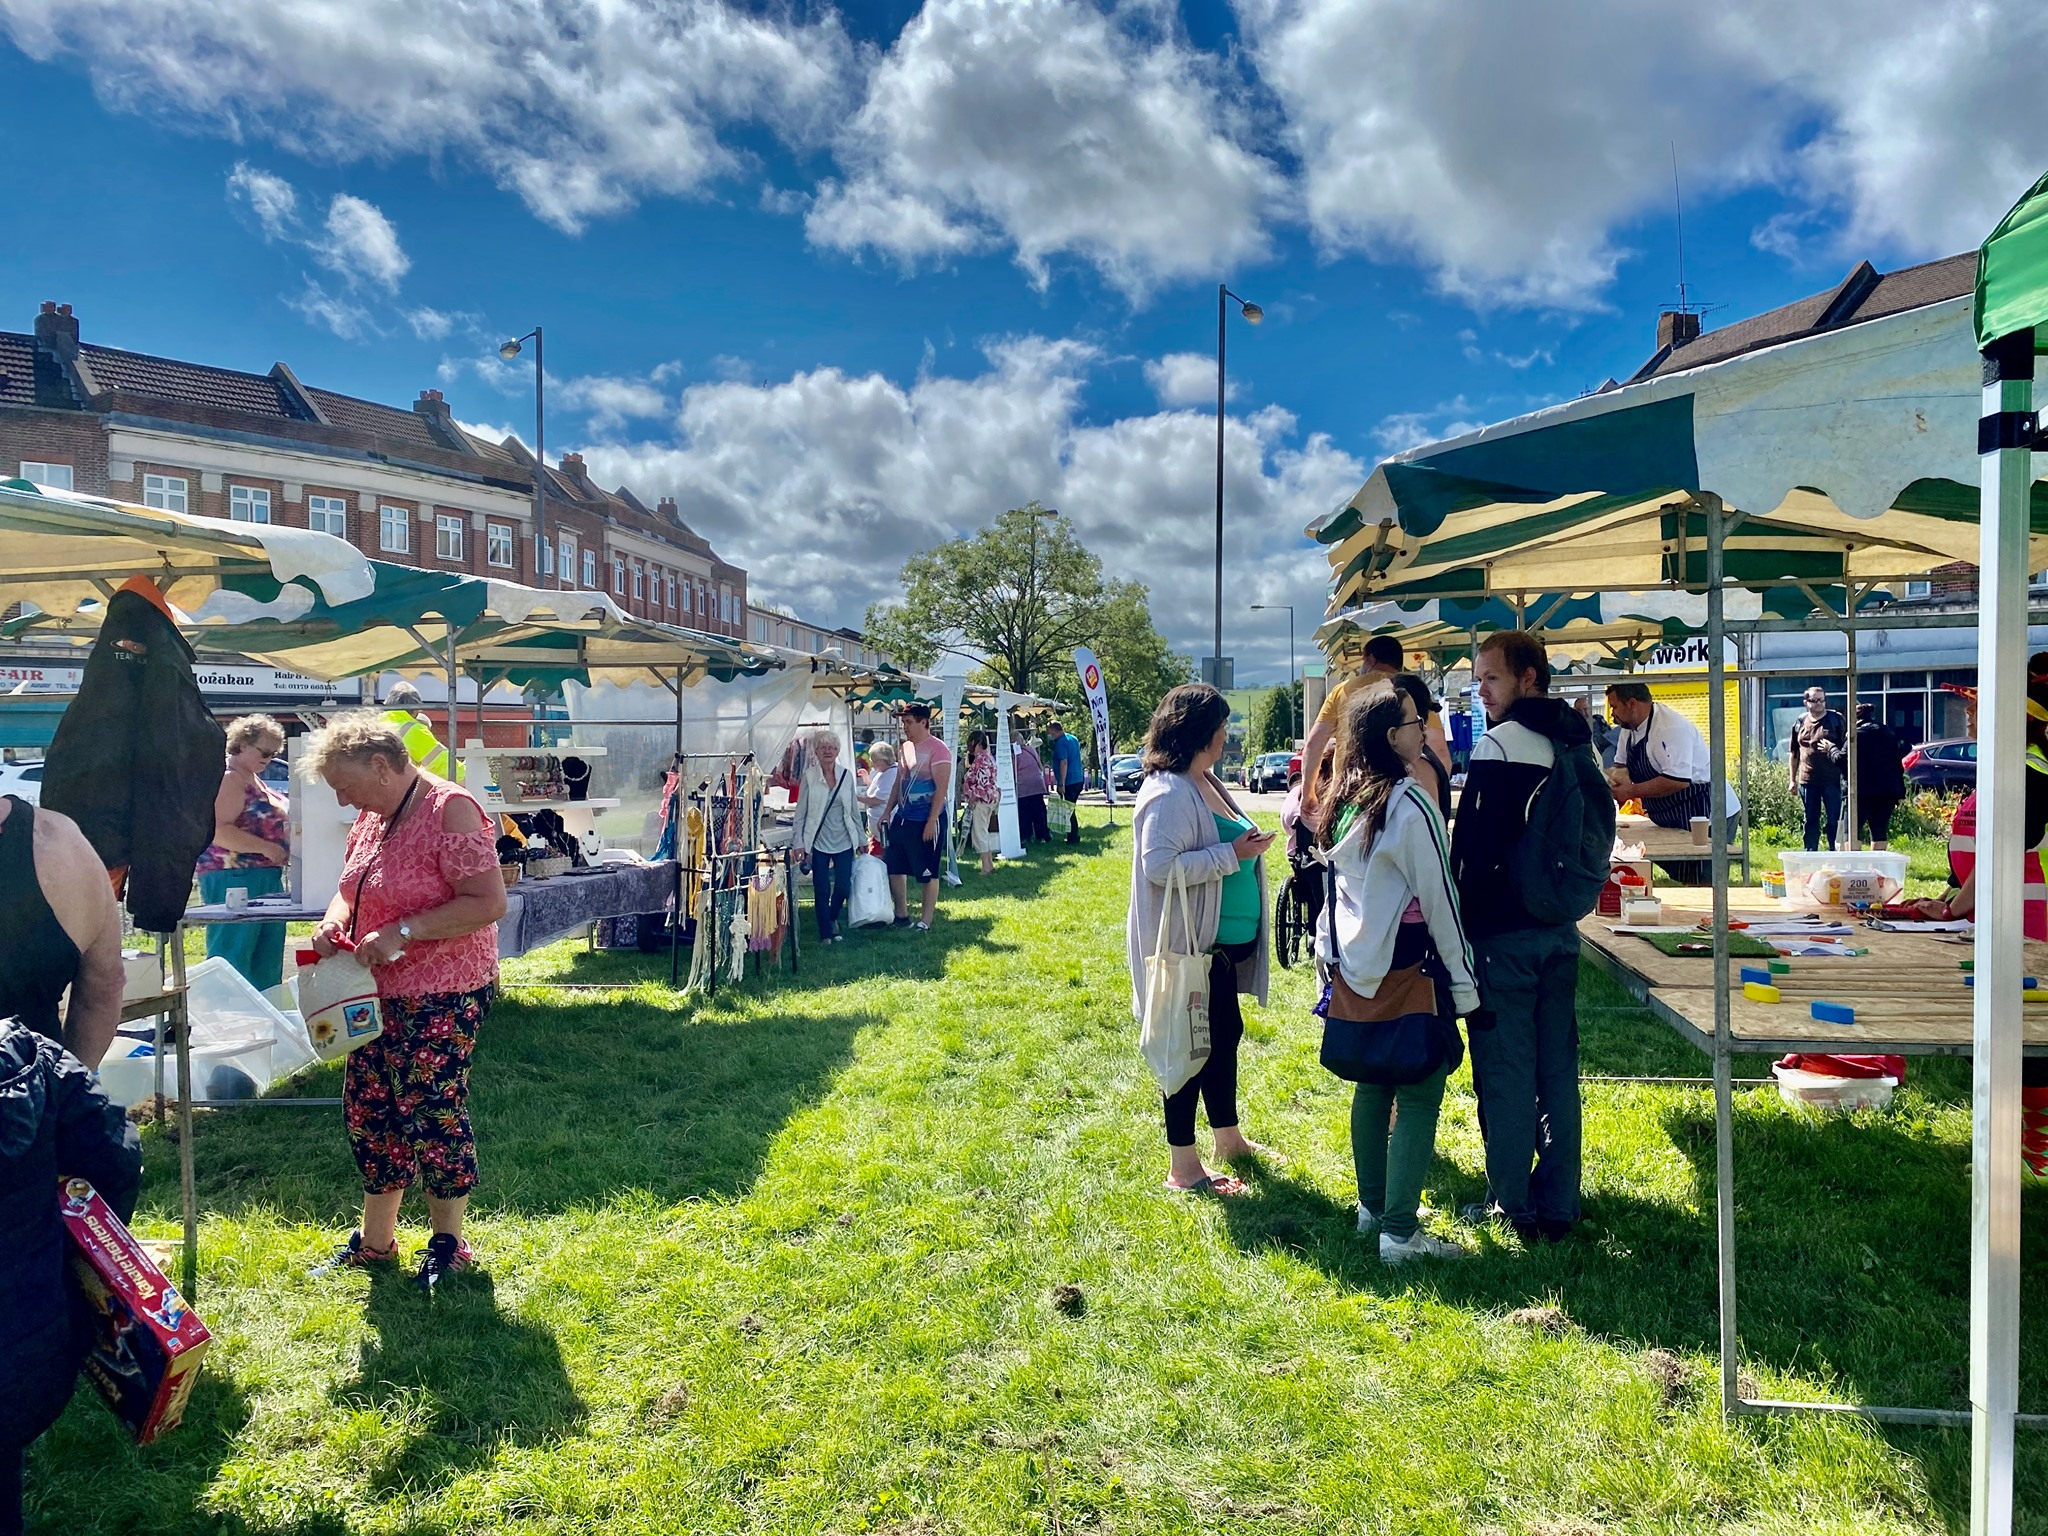 Filwood Community Market